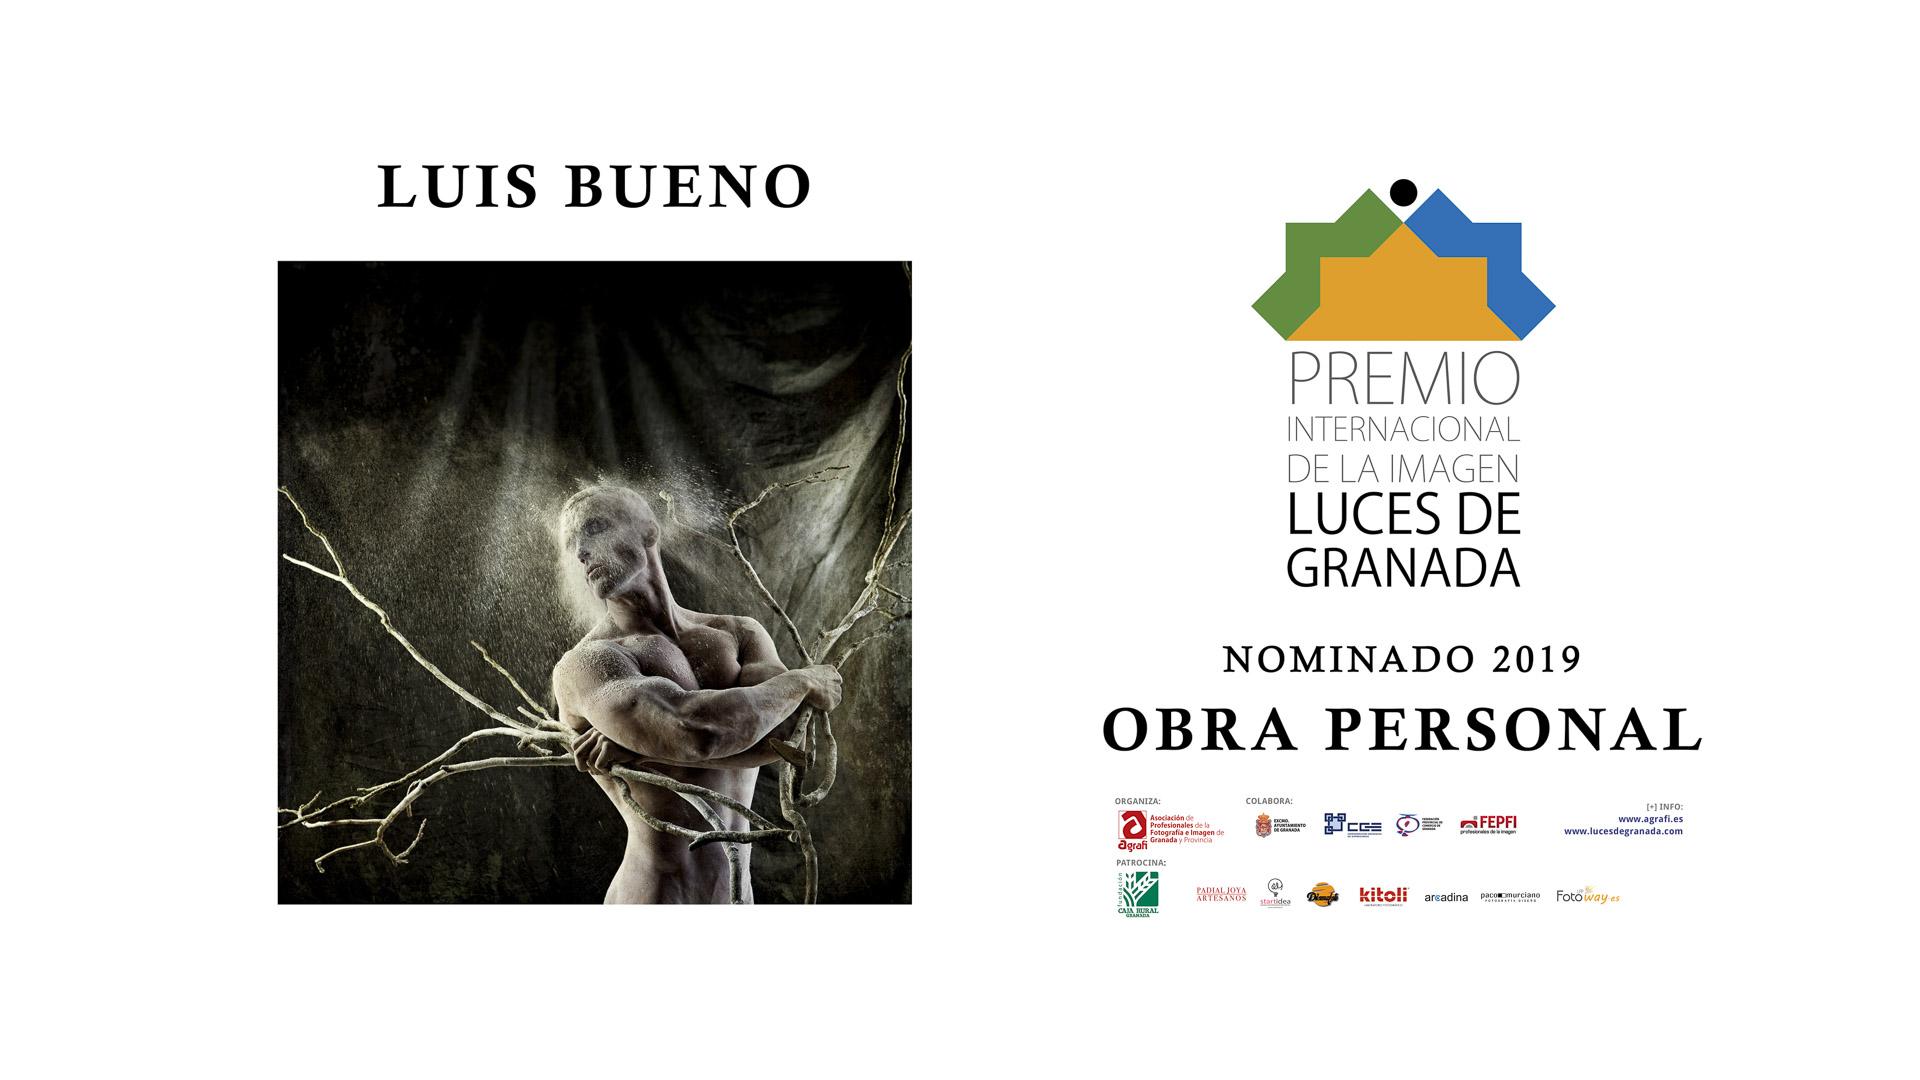 OP06_LUIS BUENO